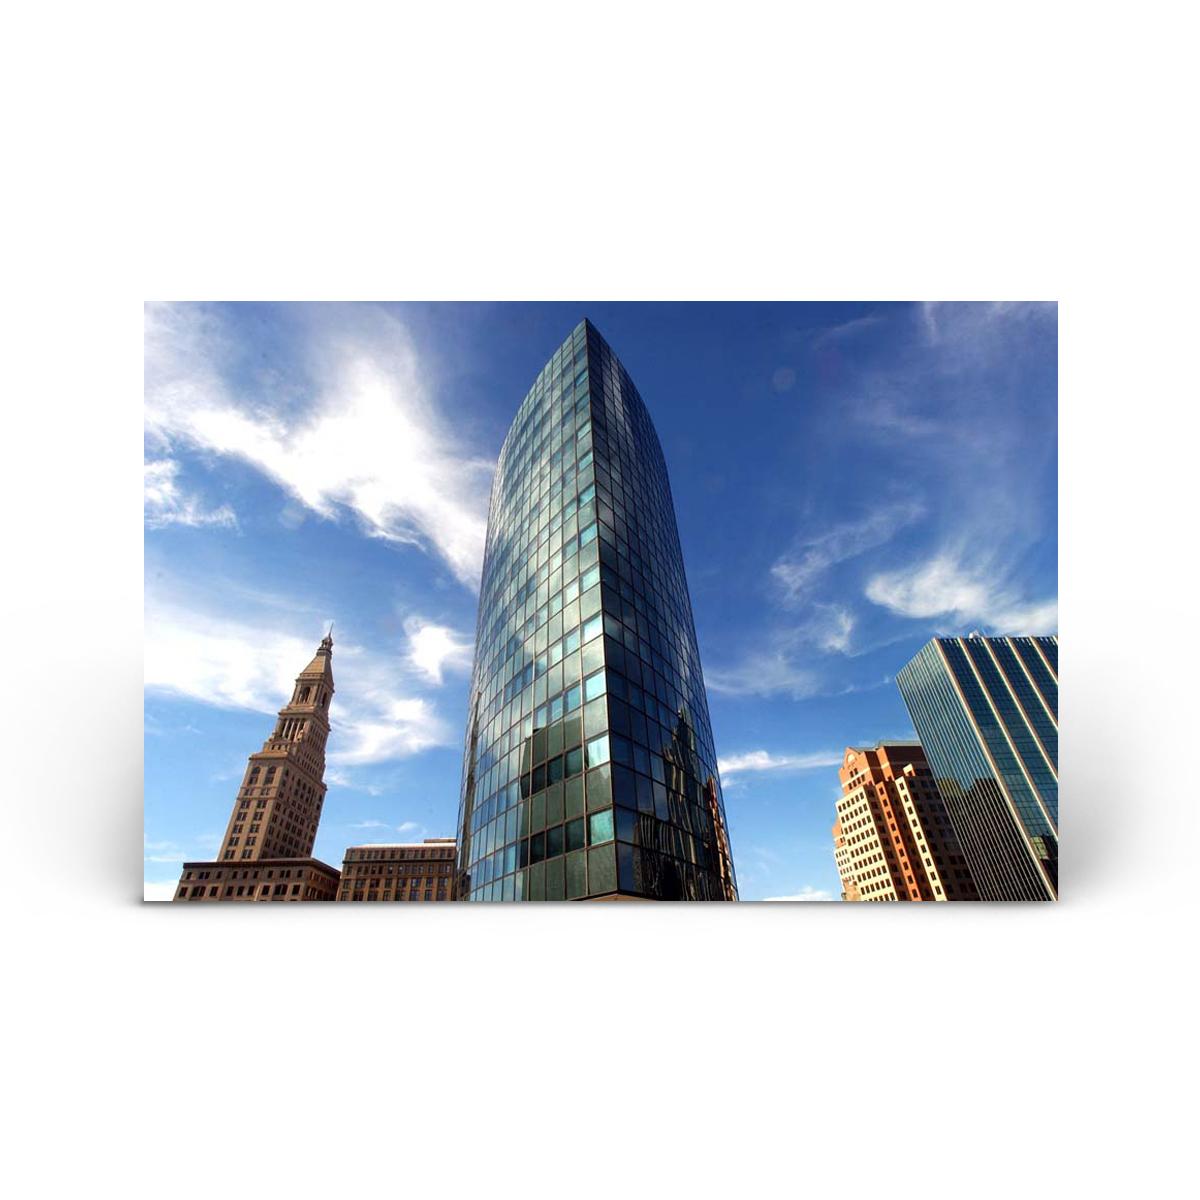 Connecticut Scenery: Phoenix Life Insurance Building